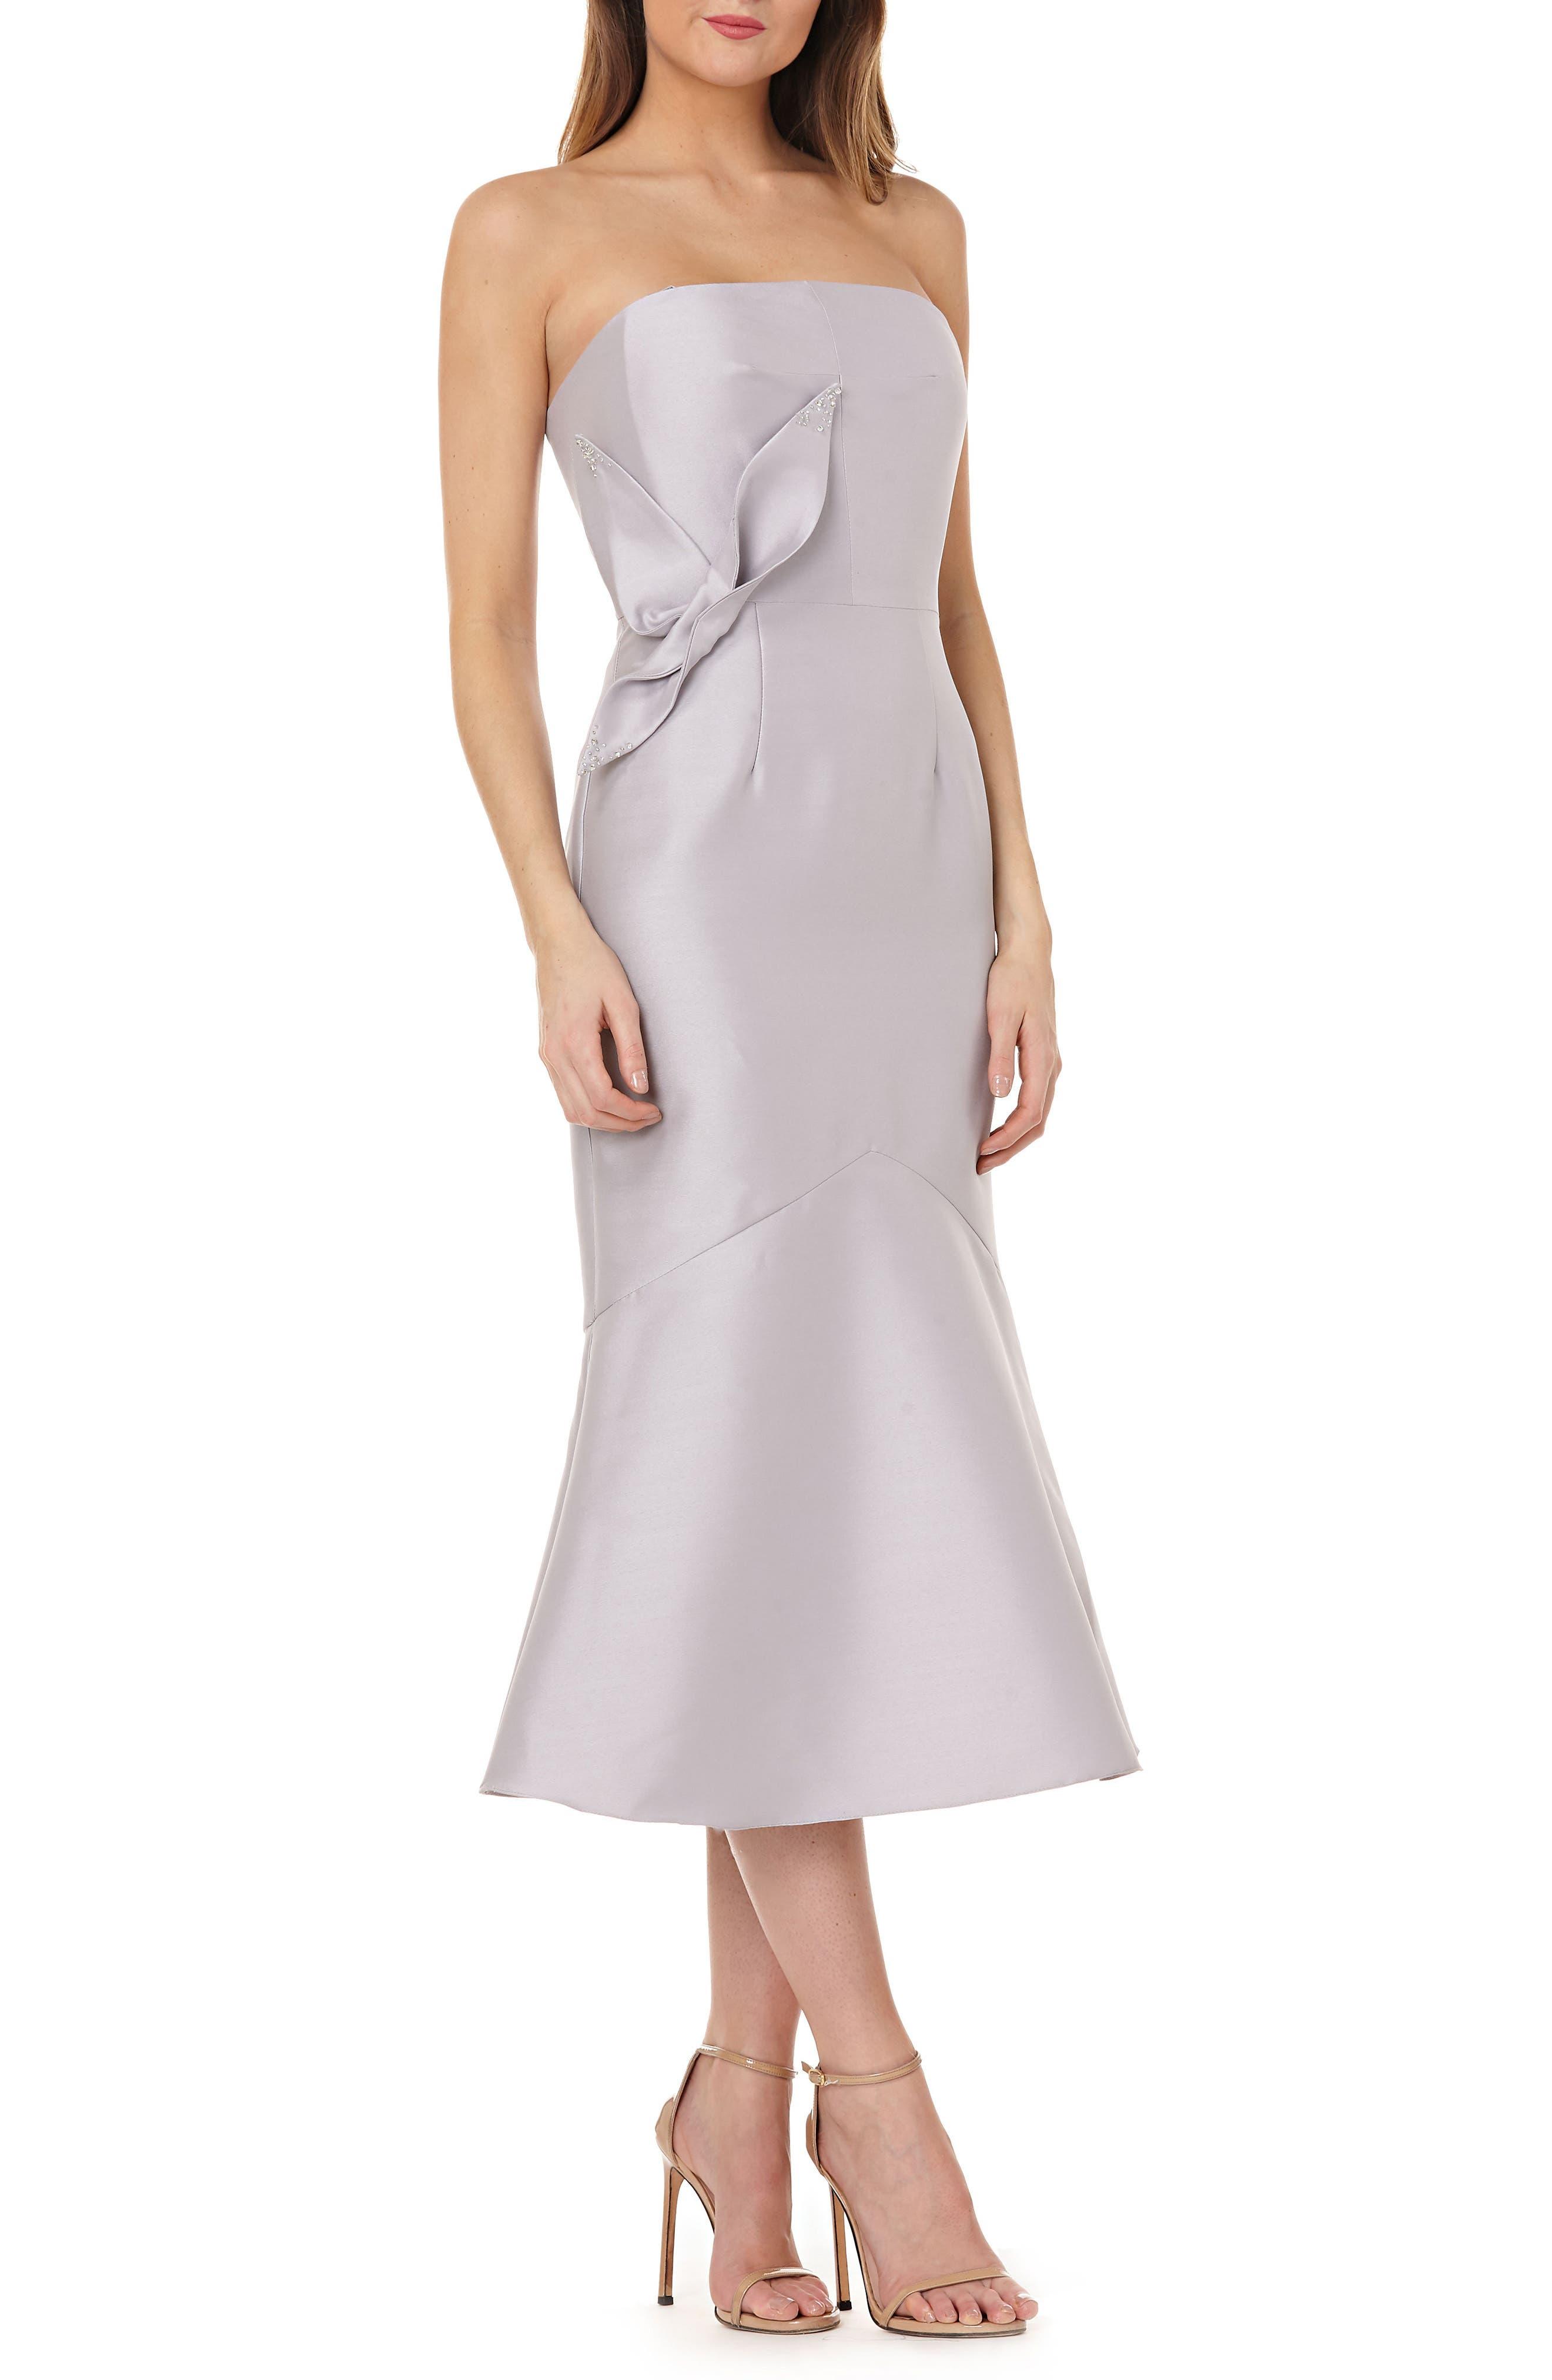 Strapless Satin Tea Length Dress,                             Main thumbnail 1, color,                             Dove Grey